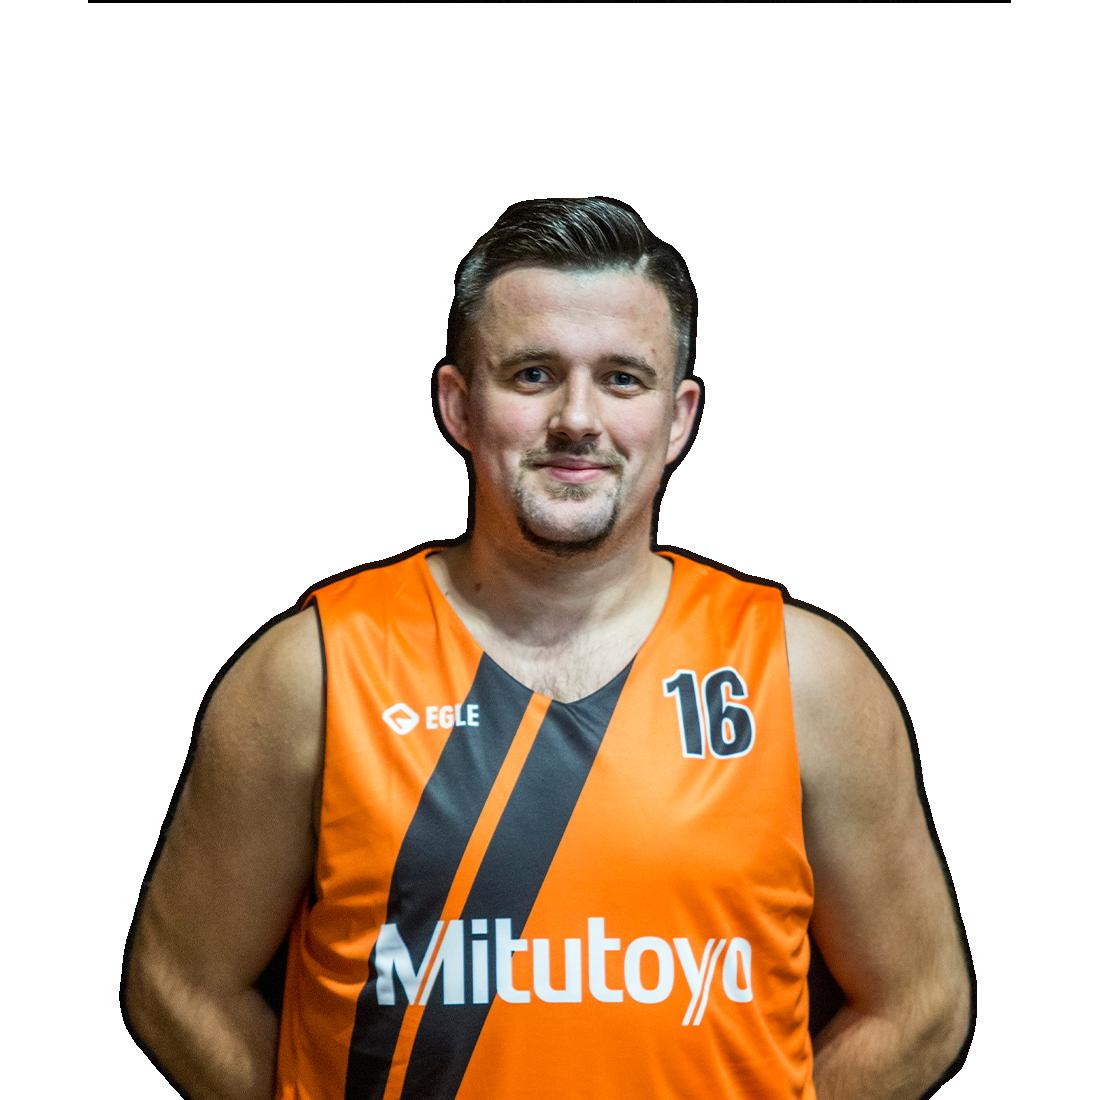 Jakub Bubula